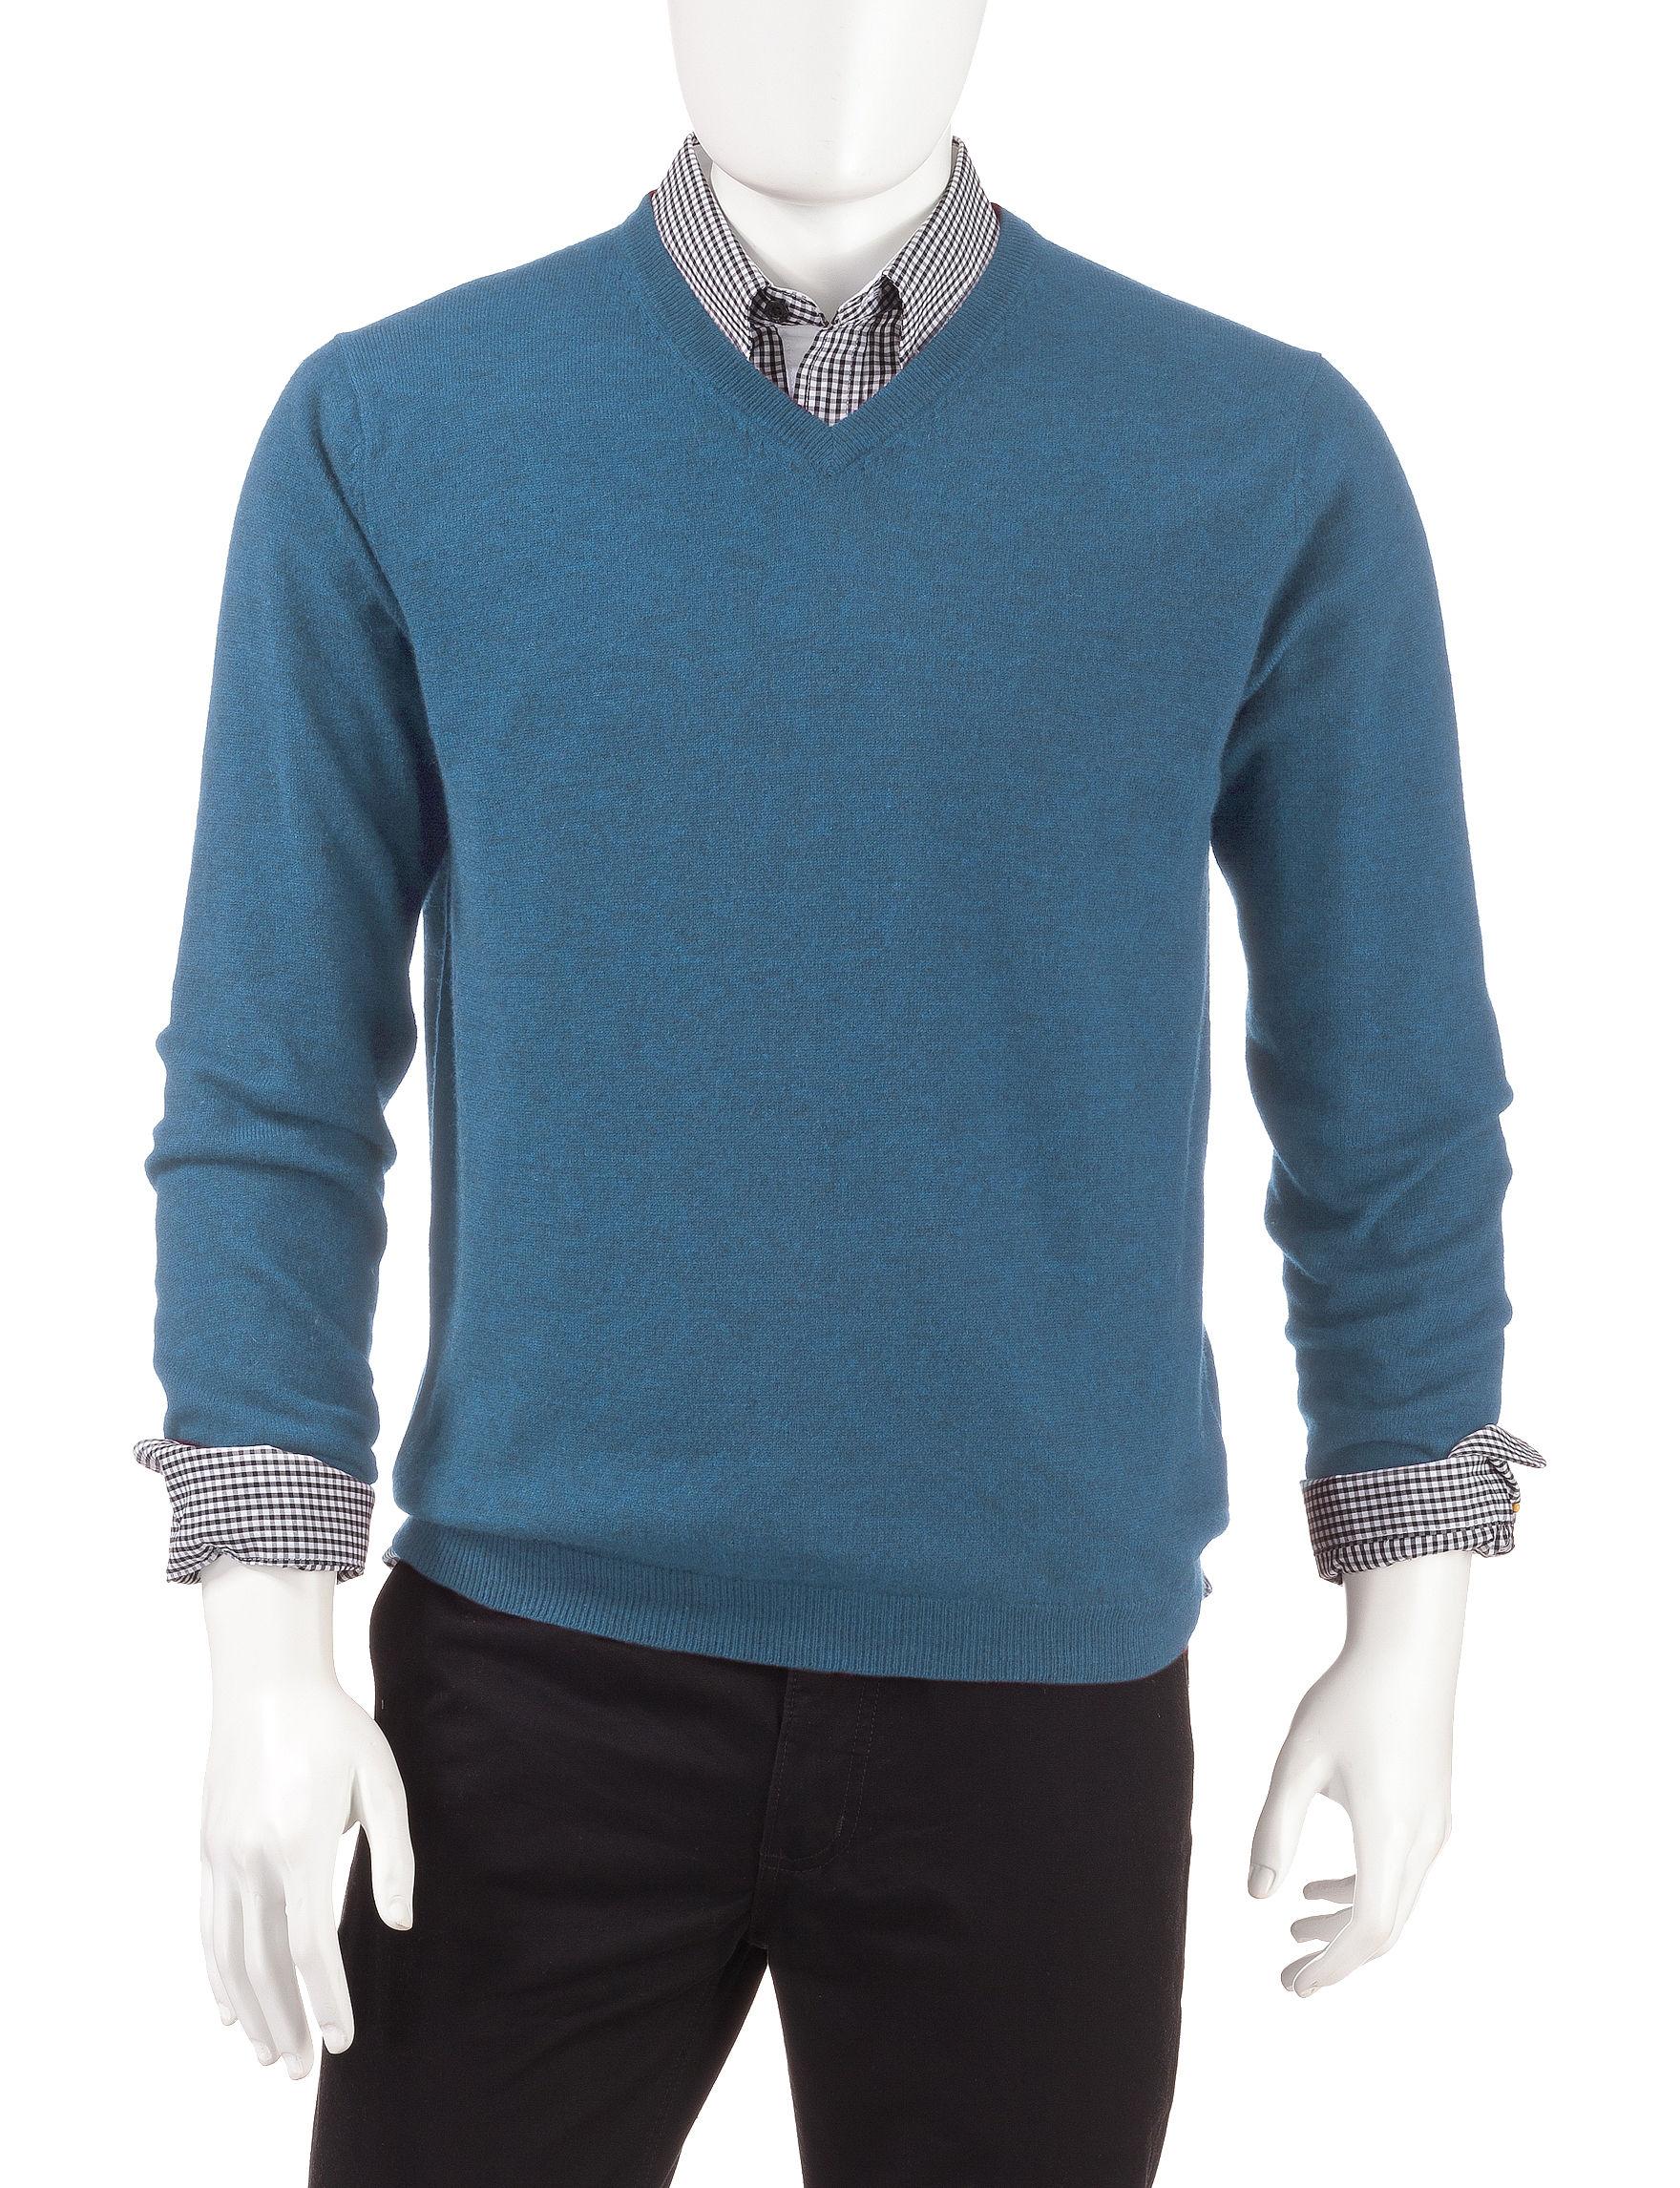 Weatherproof Blue Pull-overs Sweaters